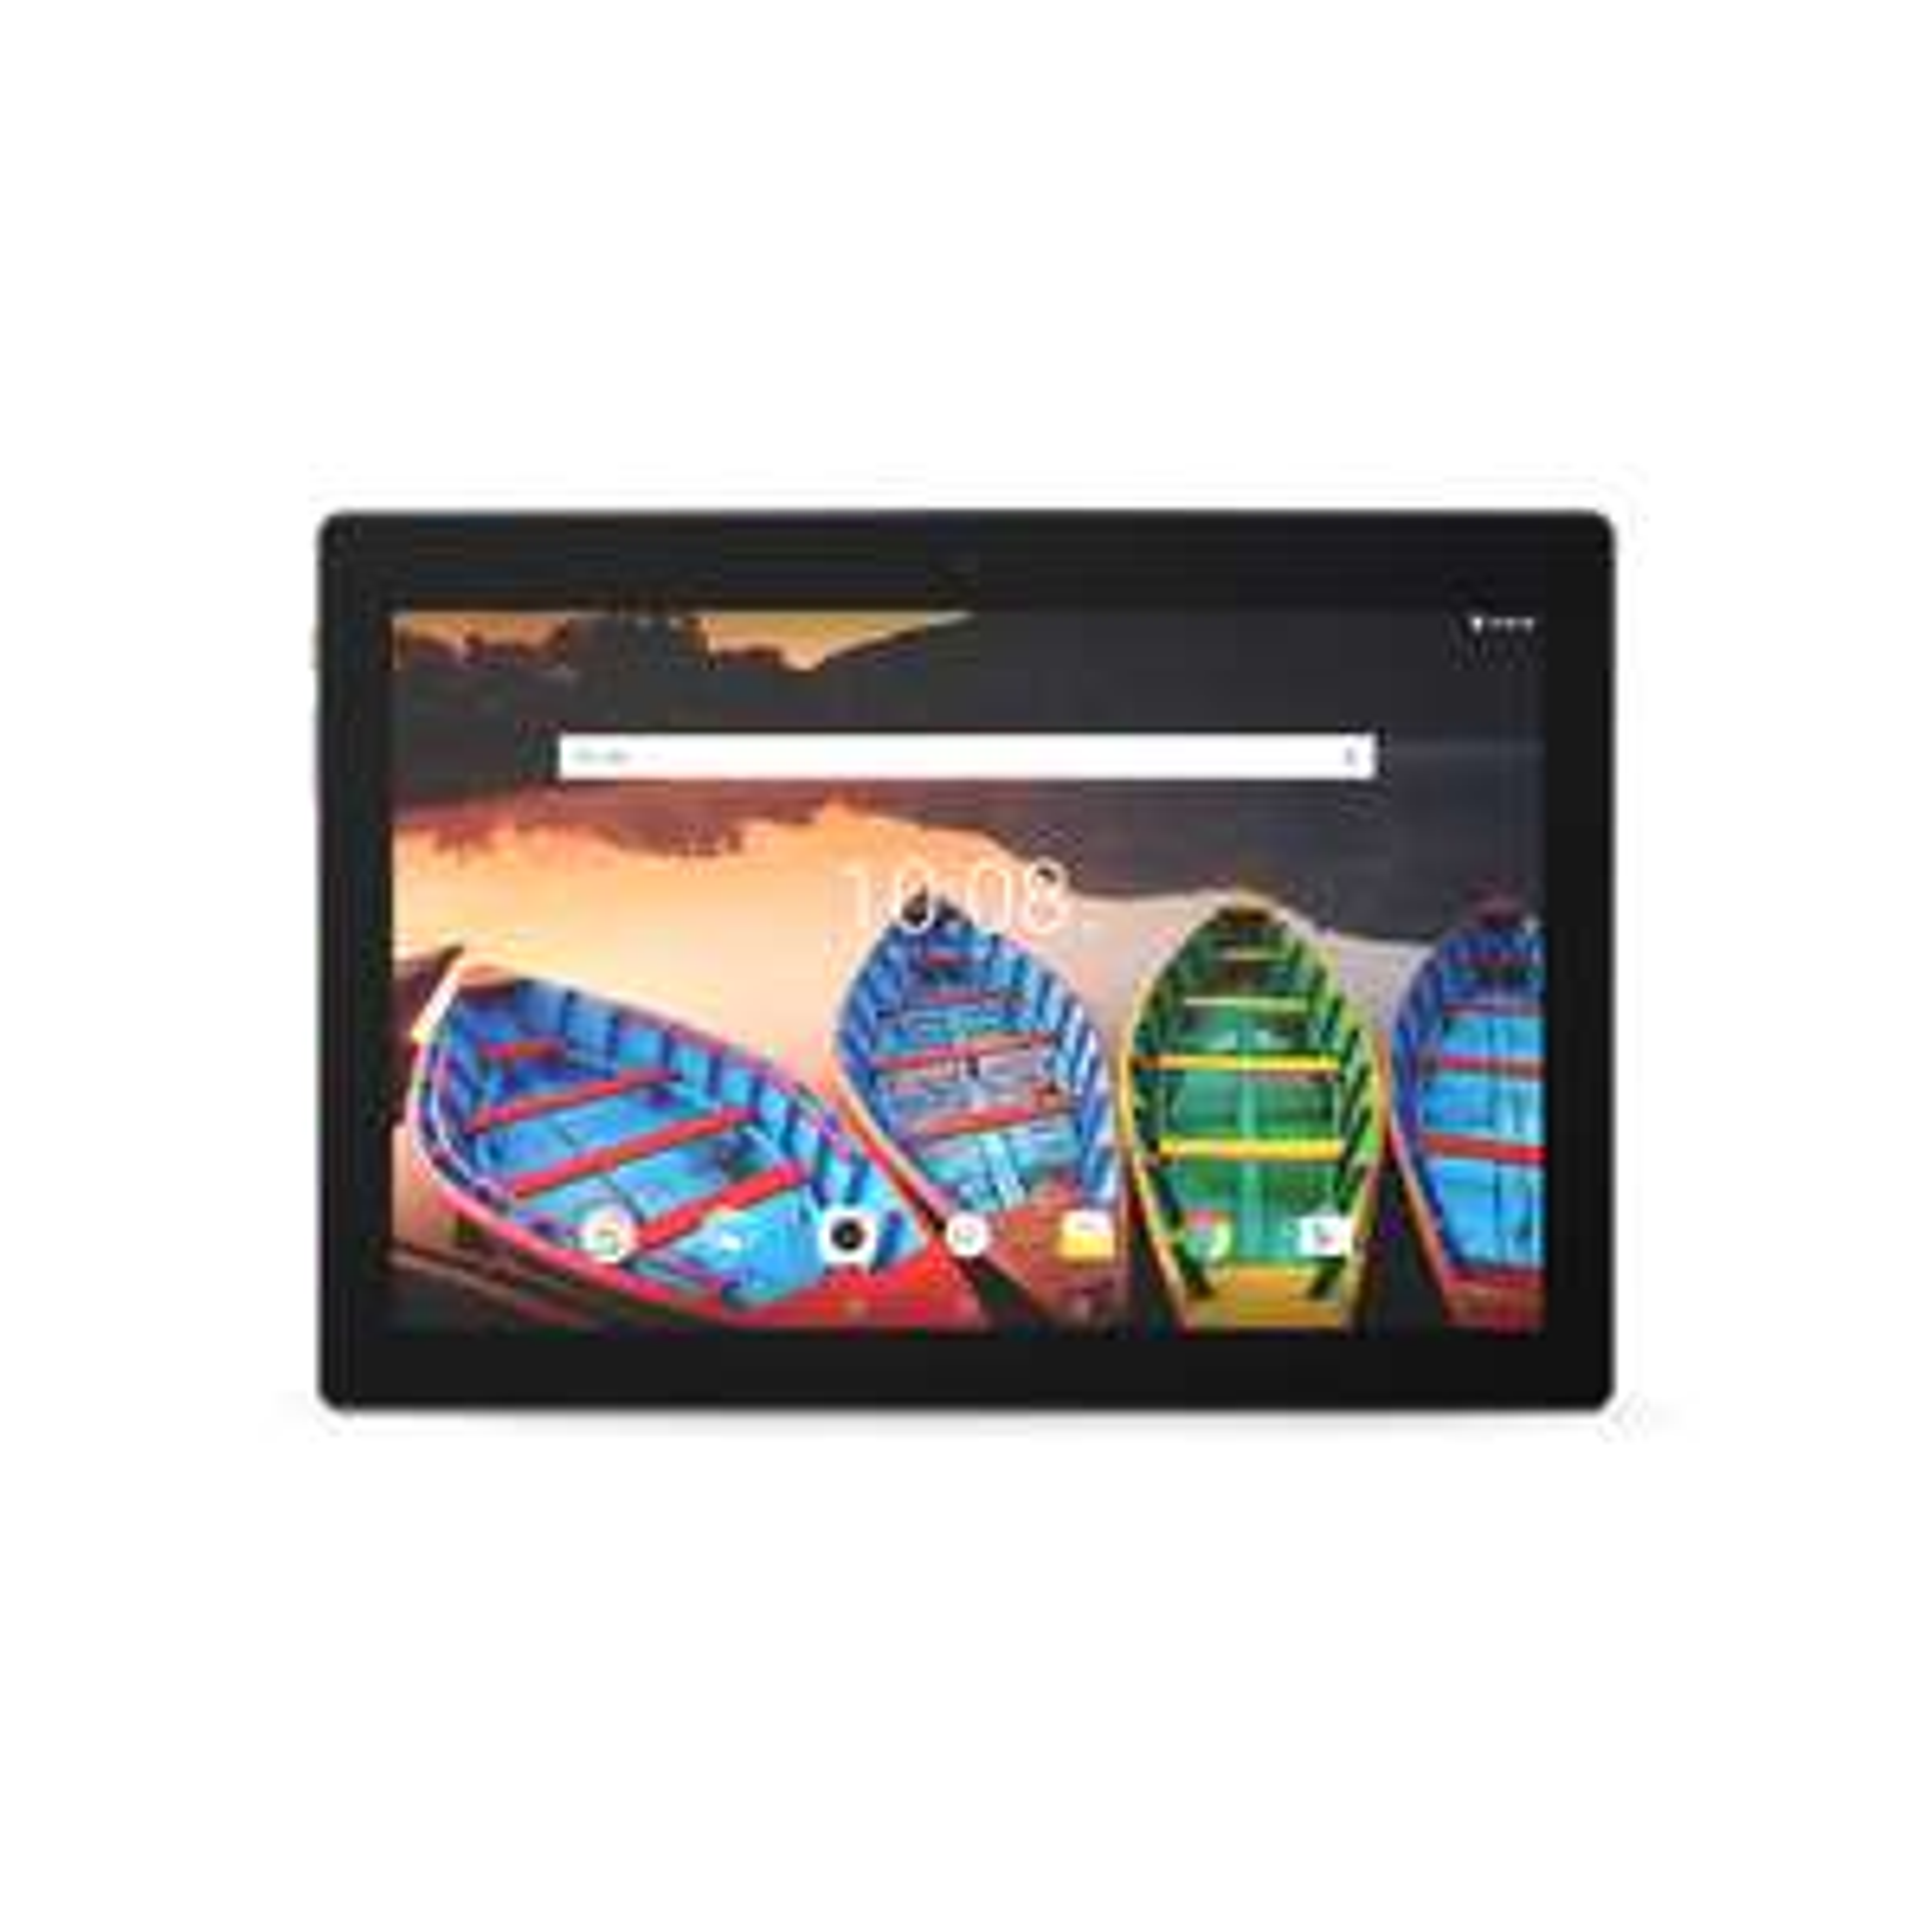 "[Cyberport] Lenovo Tab3 10 Plus TB3-X70L - 10.1"" Tablet (1920x1200, IPS, 2GB RAM, 16GB; 3G/4G, NFC, BT, 7000mAh, Android 6) ZA0Y0100DE"